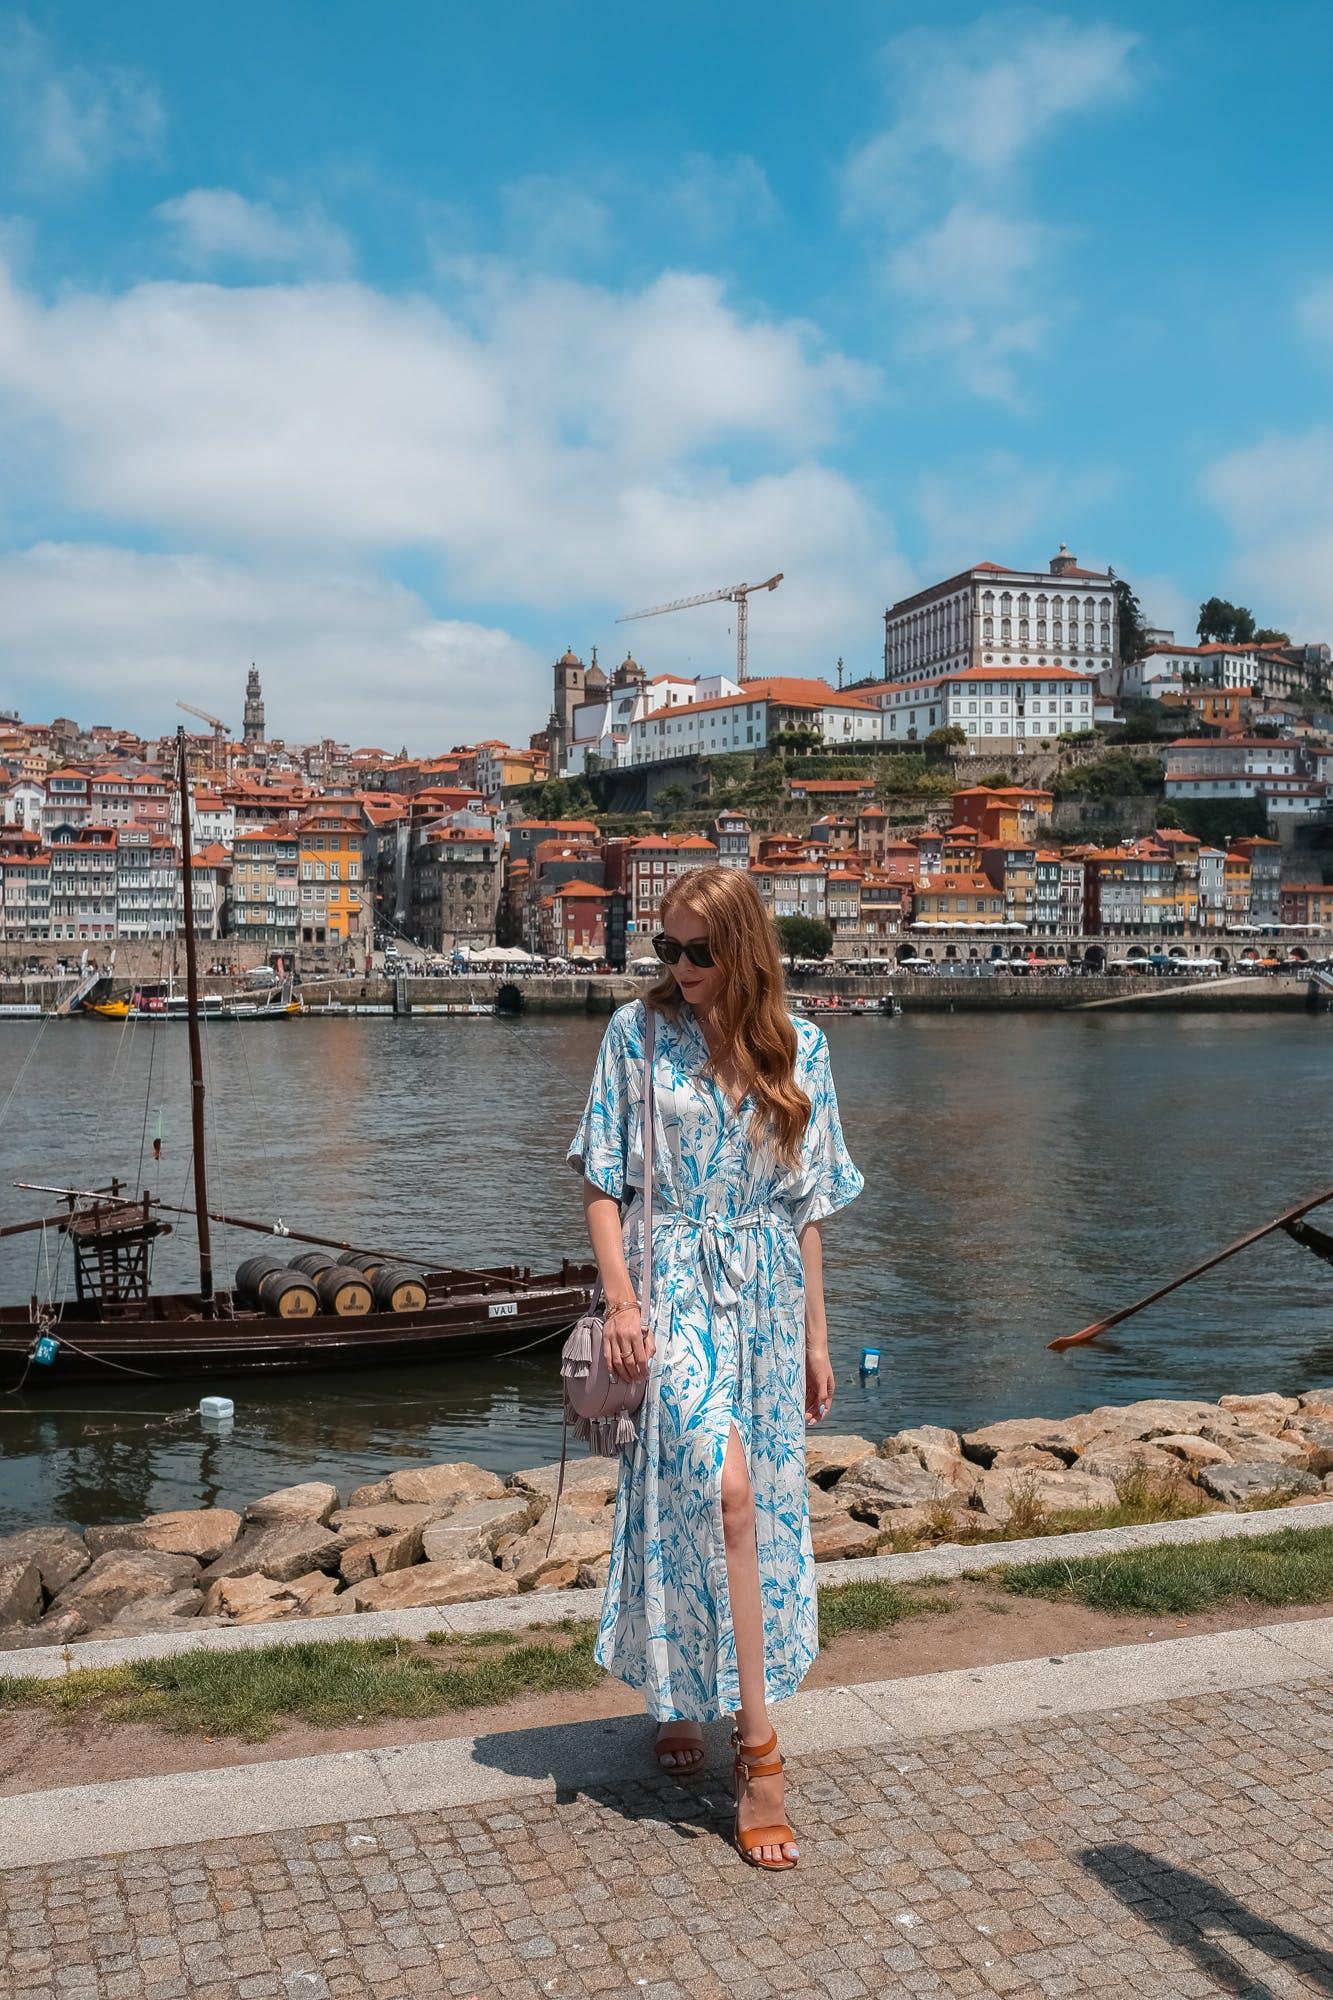 villa nova de gaia porto portugal